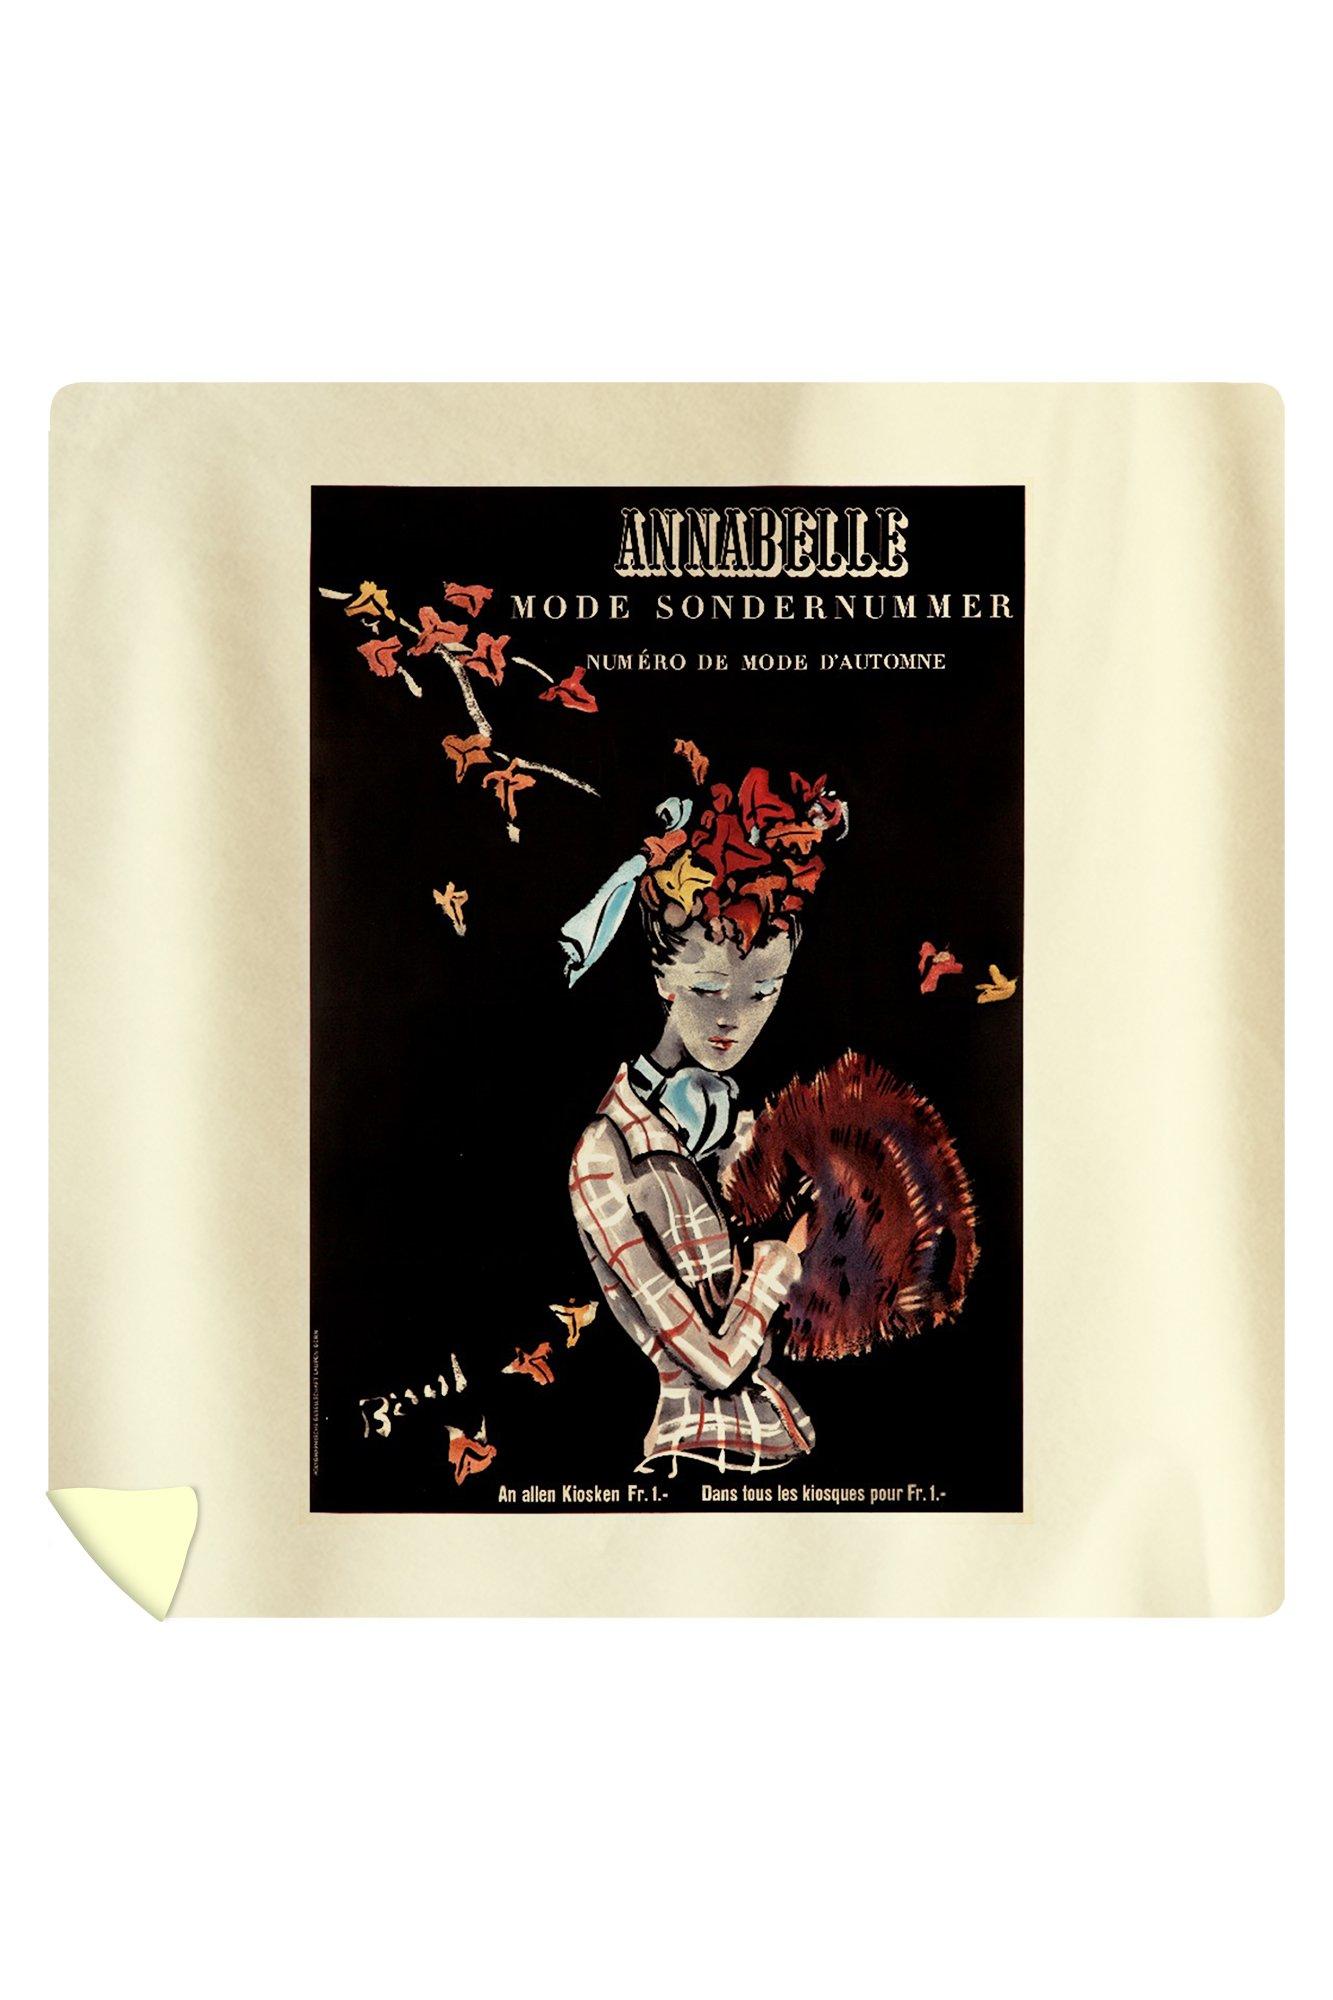 Annabelle Vintage Poster (artist: Christian Berand) Switzerland c. 1942 (88x88 Queen Microfiber Duvet Cover)